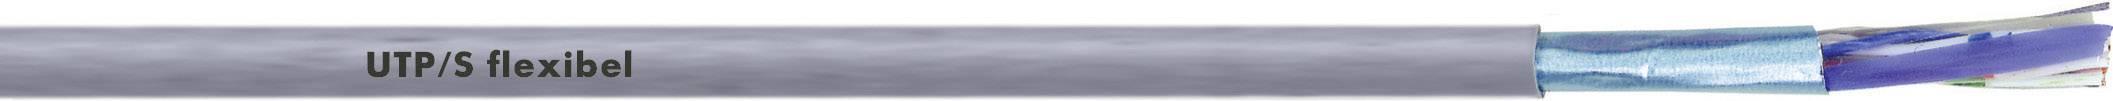 Sieťový kábel ethernetový CAT 5 LappKabel UNITRONIC LAN 200 F/UTP CAT.5ELSZH FLEX, S/UTP, 4 x 2 x 0.13 mm², sivá, 100 m